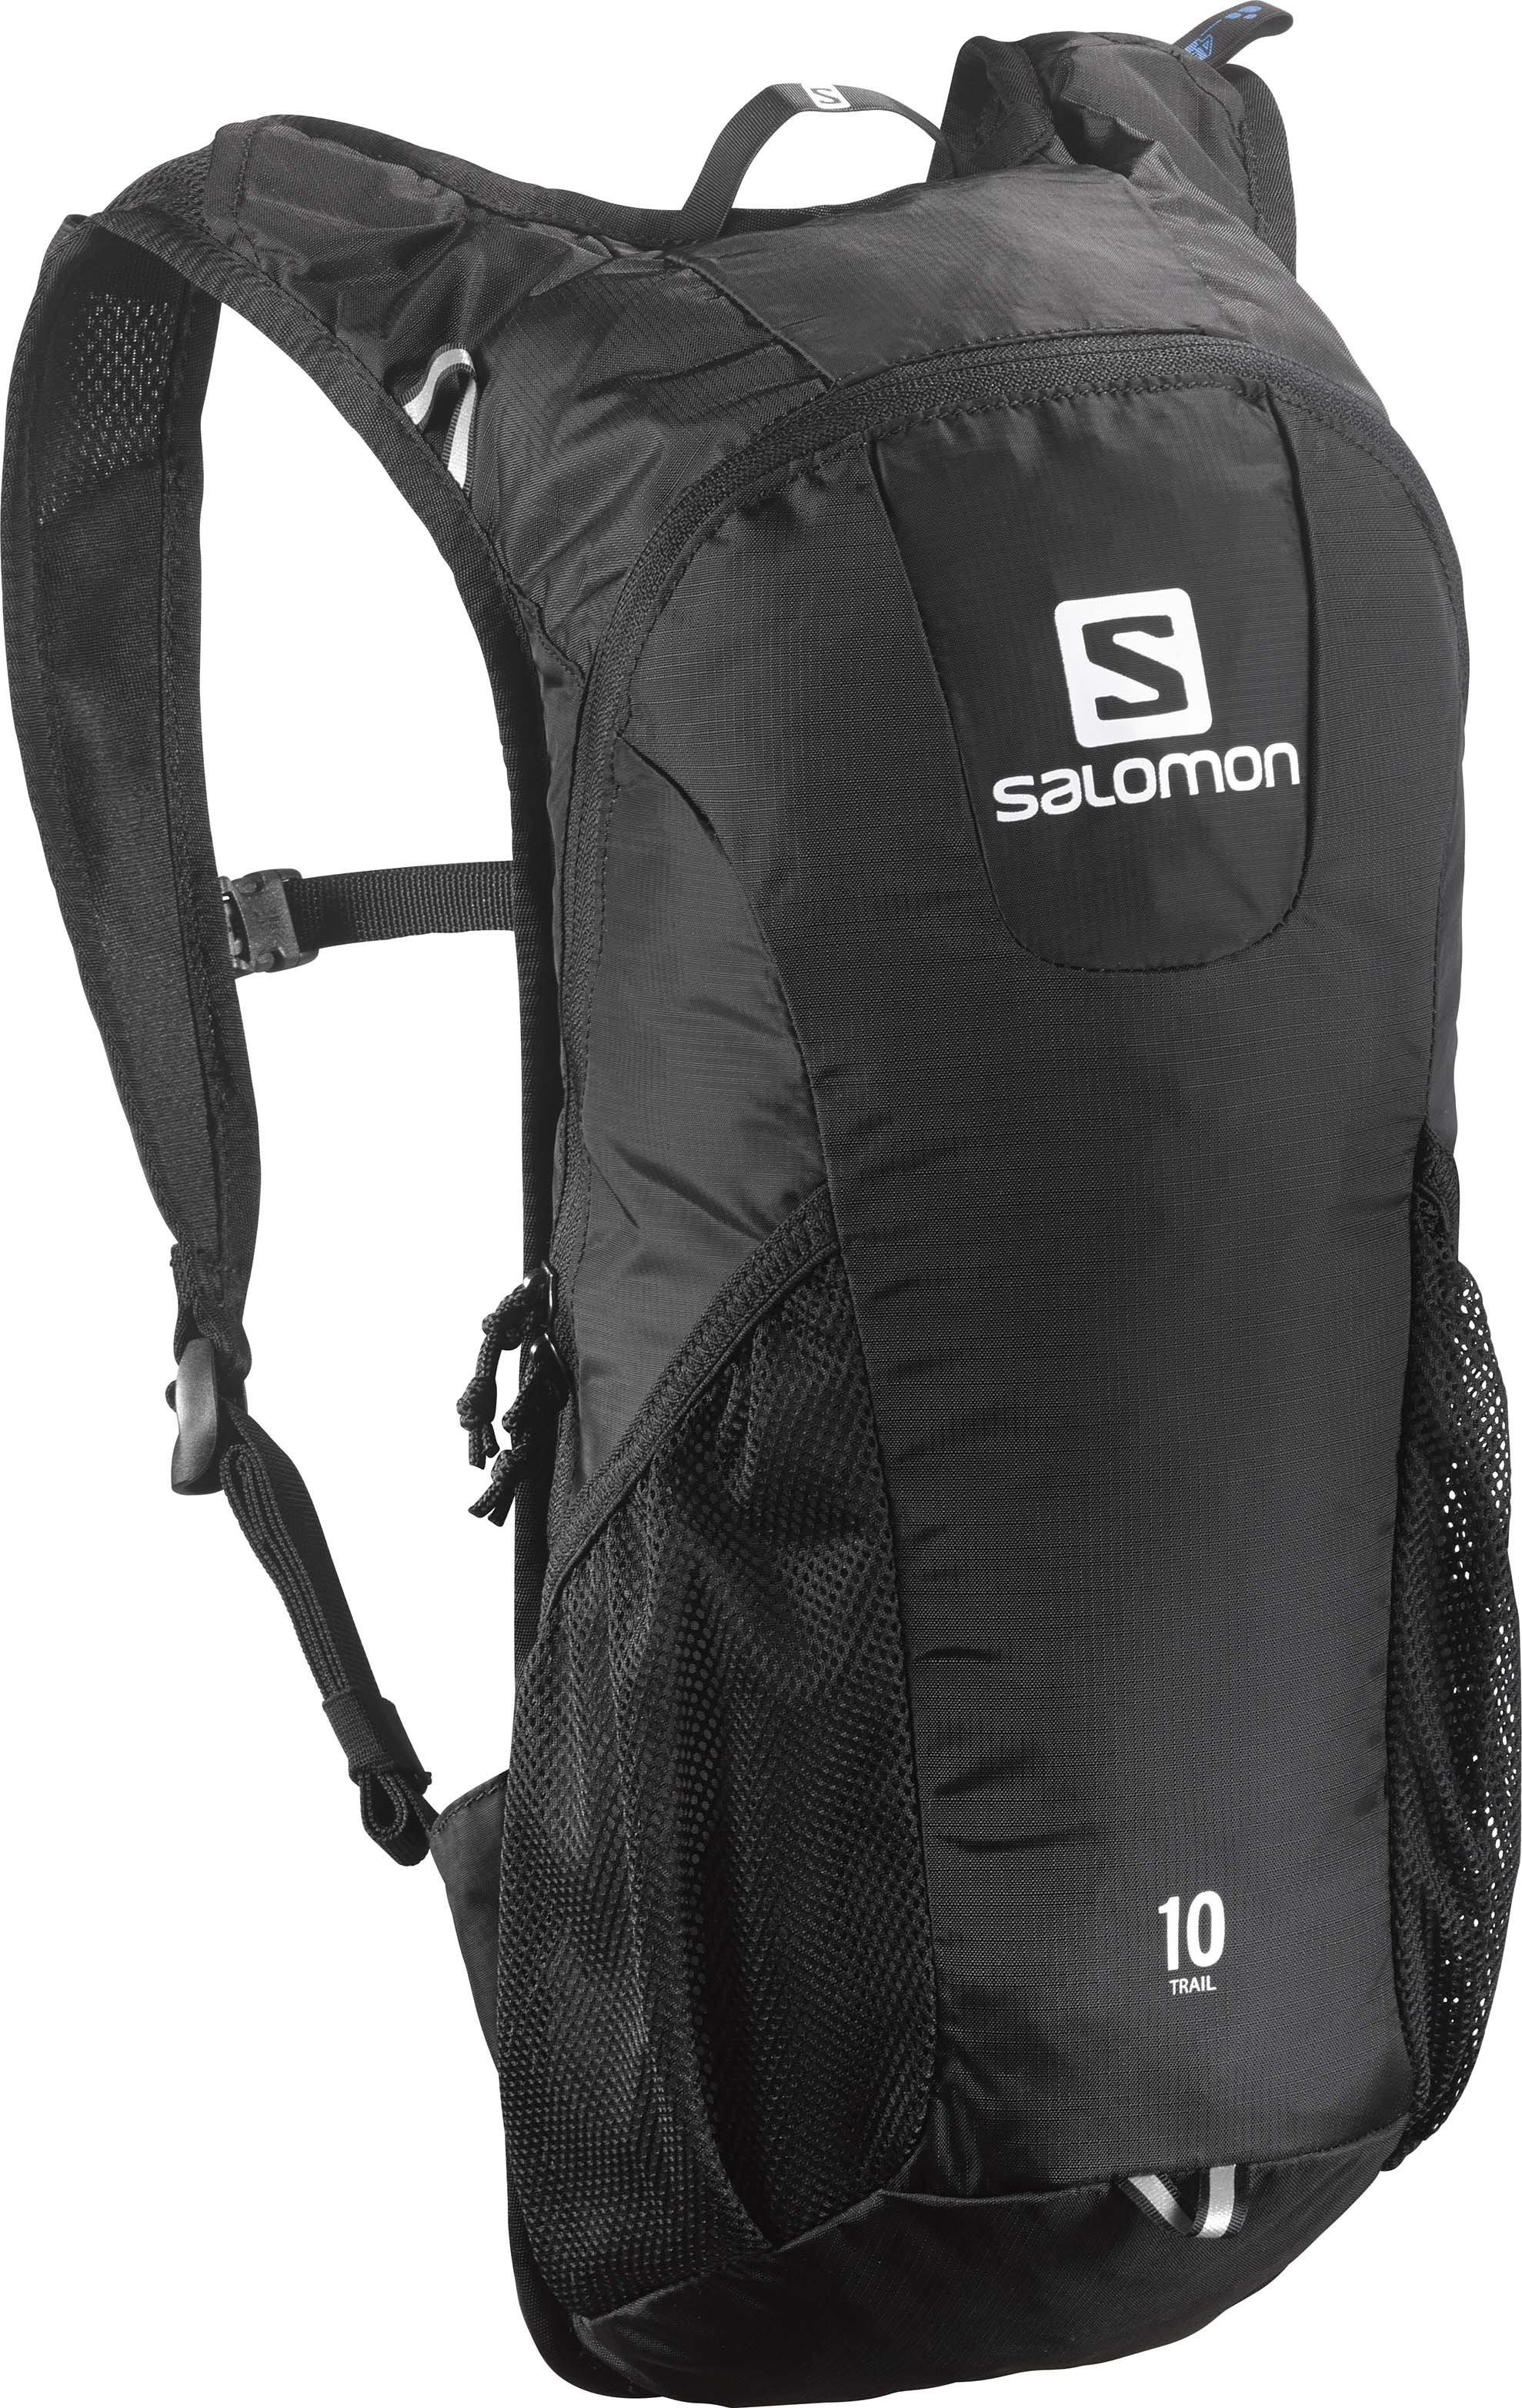 Běžecký batoh Salomon Trail 10